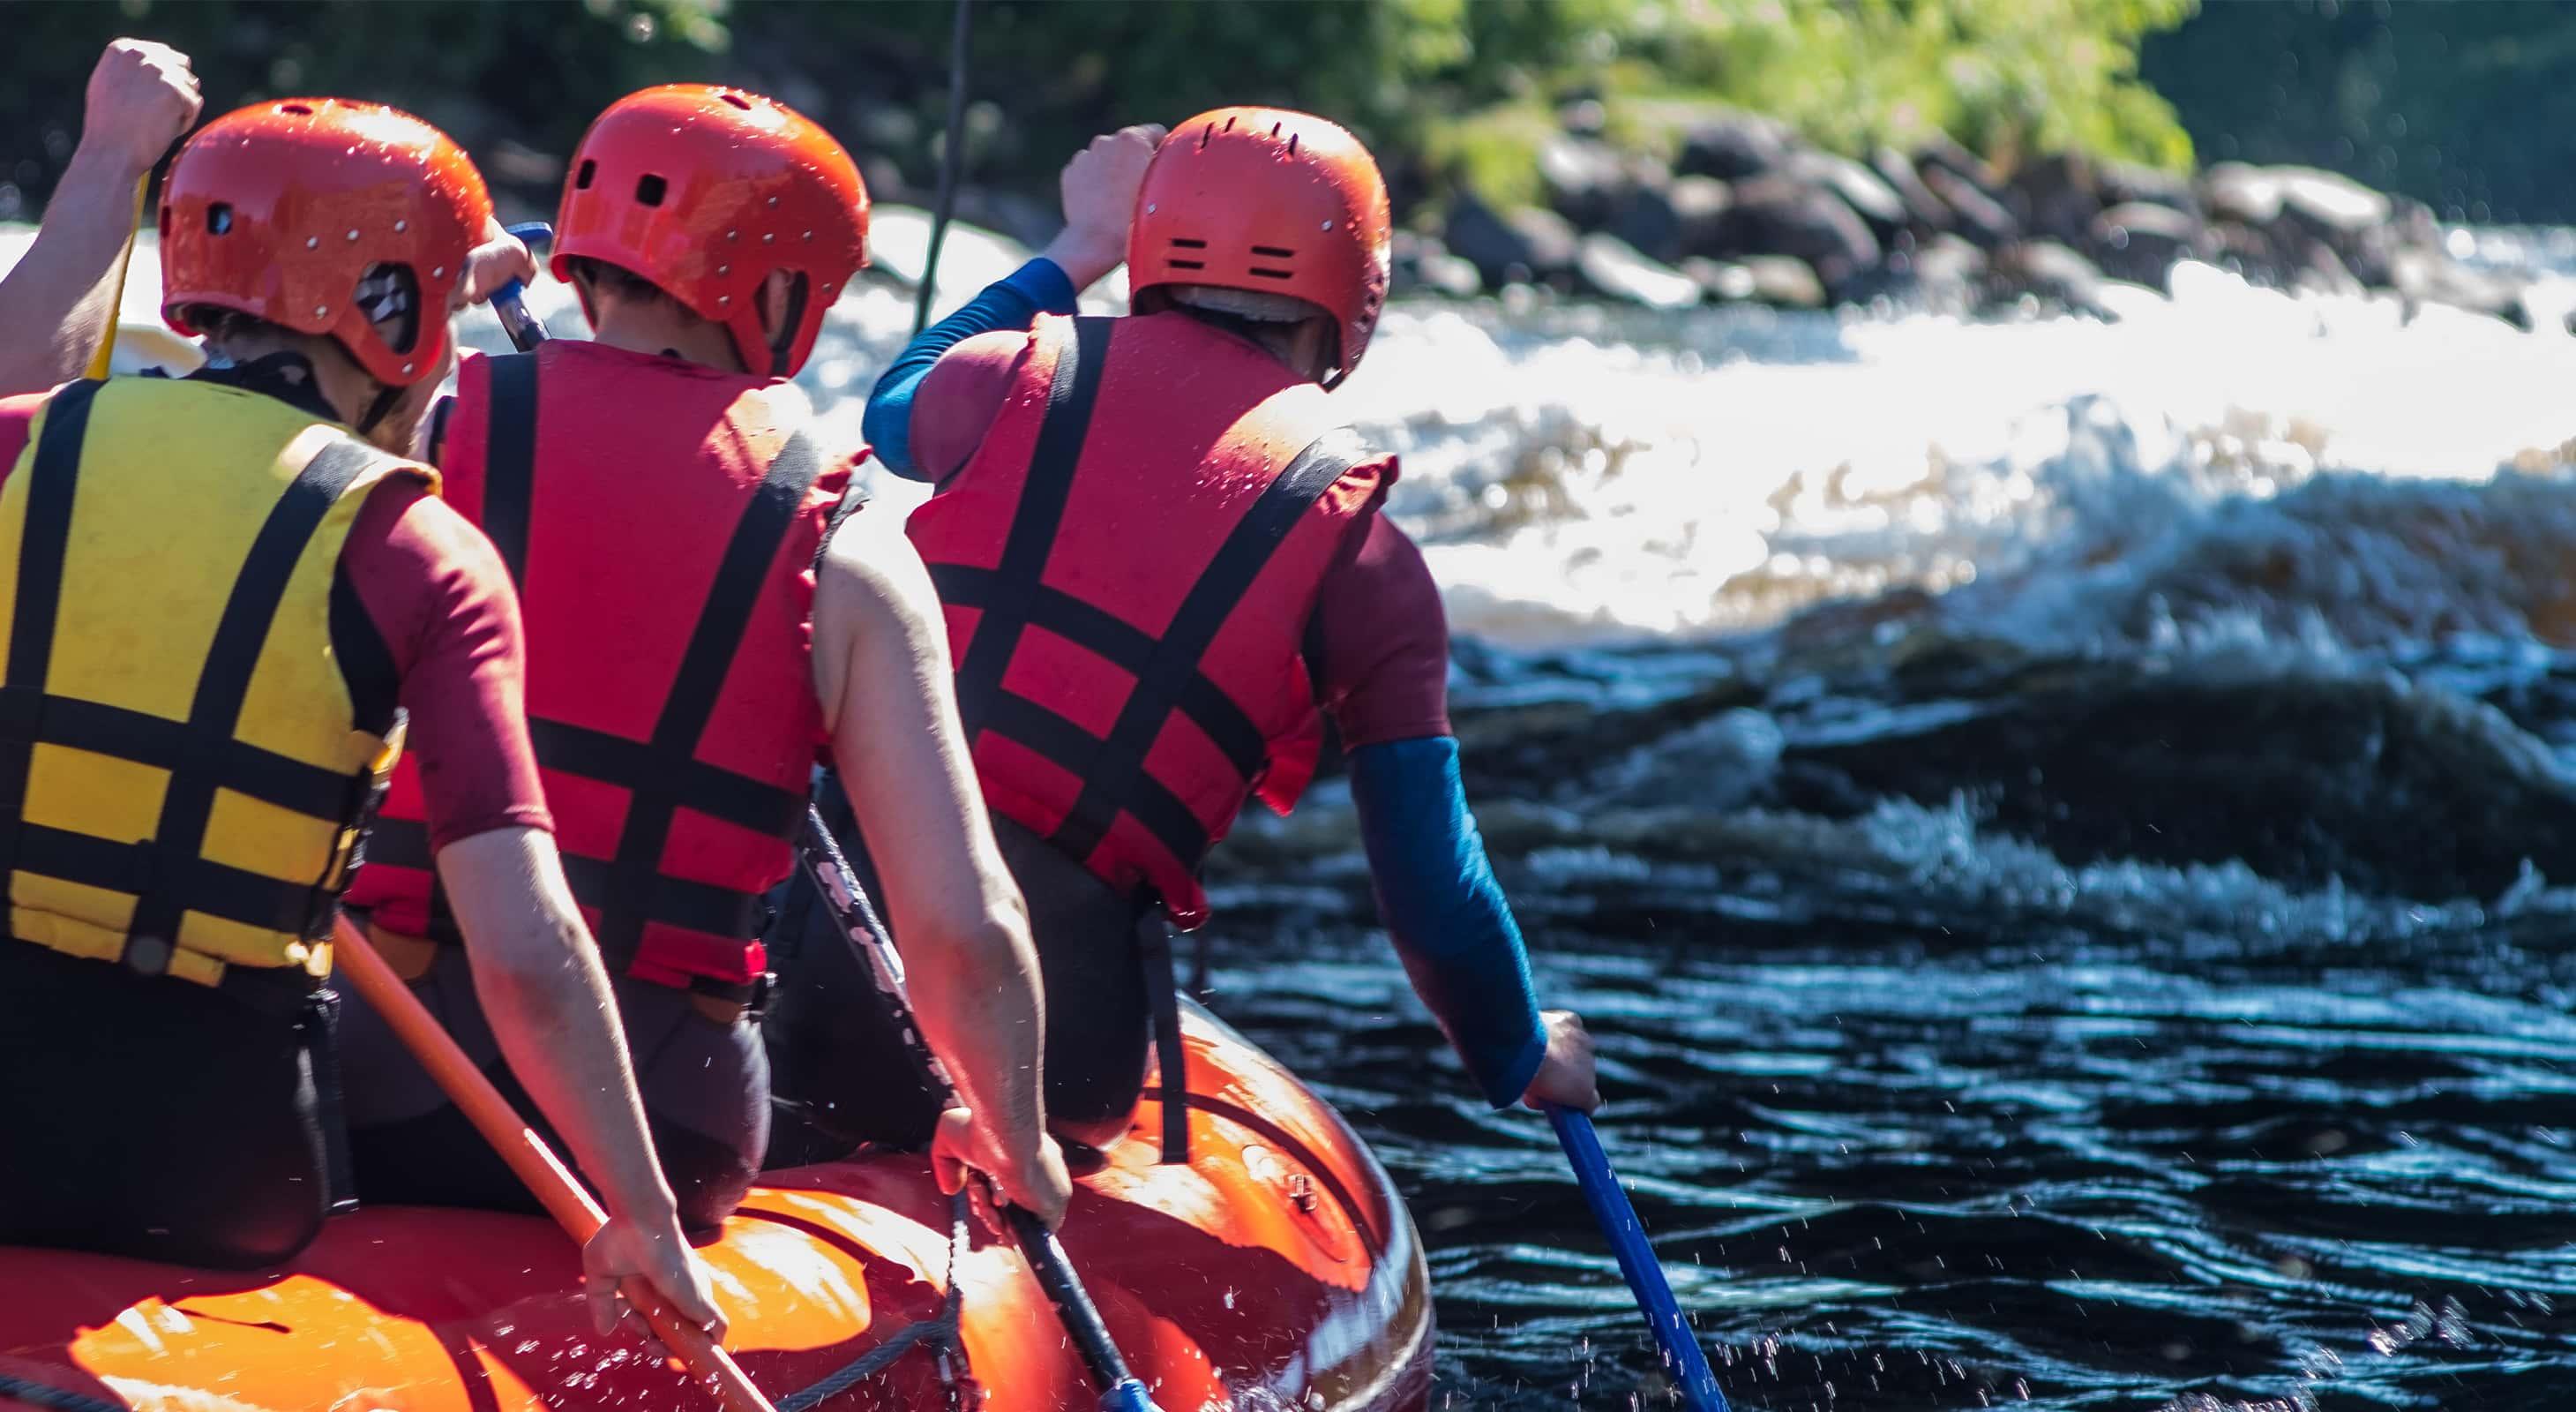 White water rafting - Top activities near Boone, NC